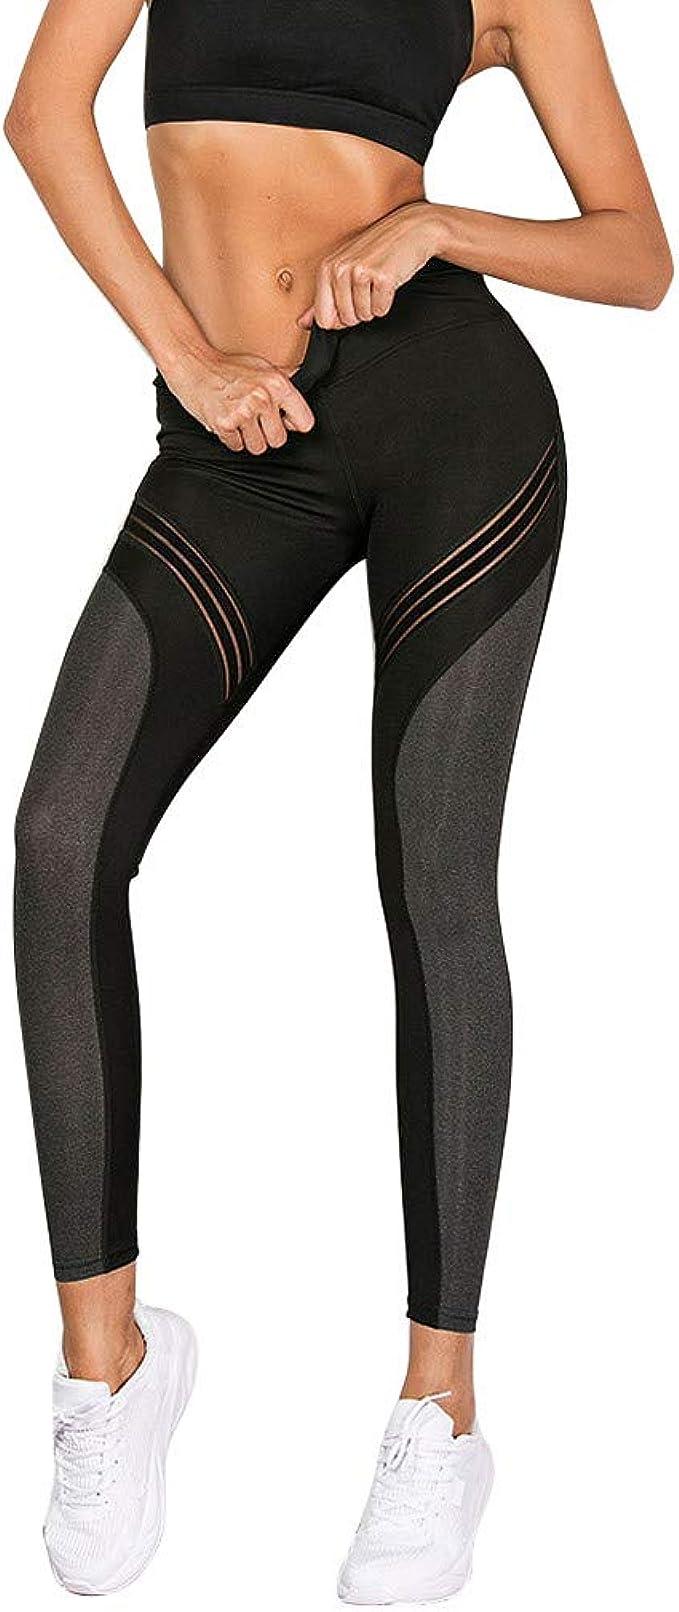 Amazon.com: Yoga Pants Womens Sports Zipper Fitness Hip-up ...